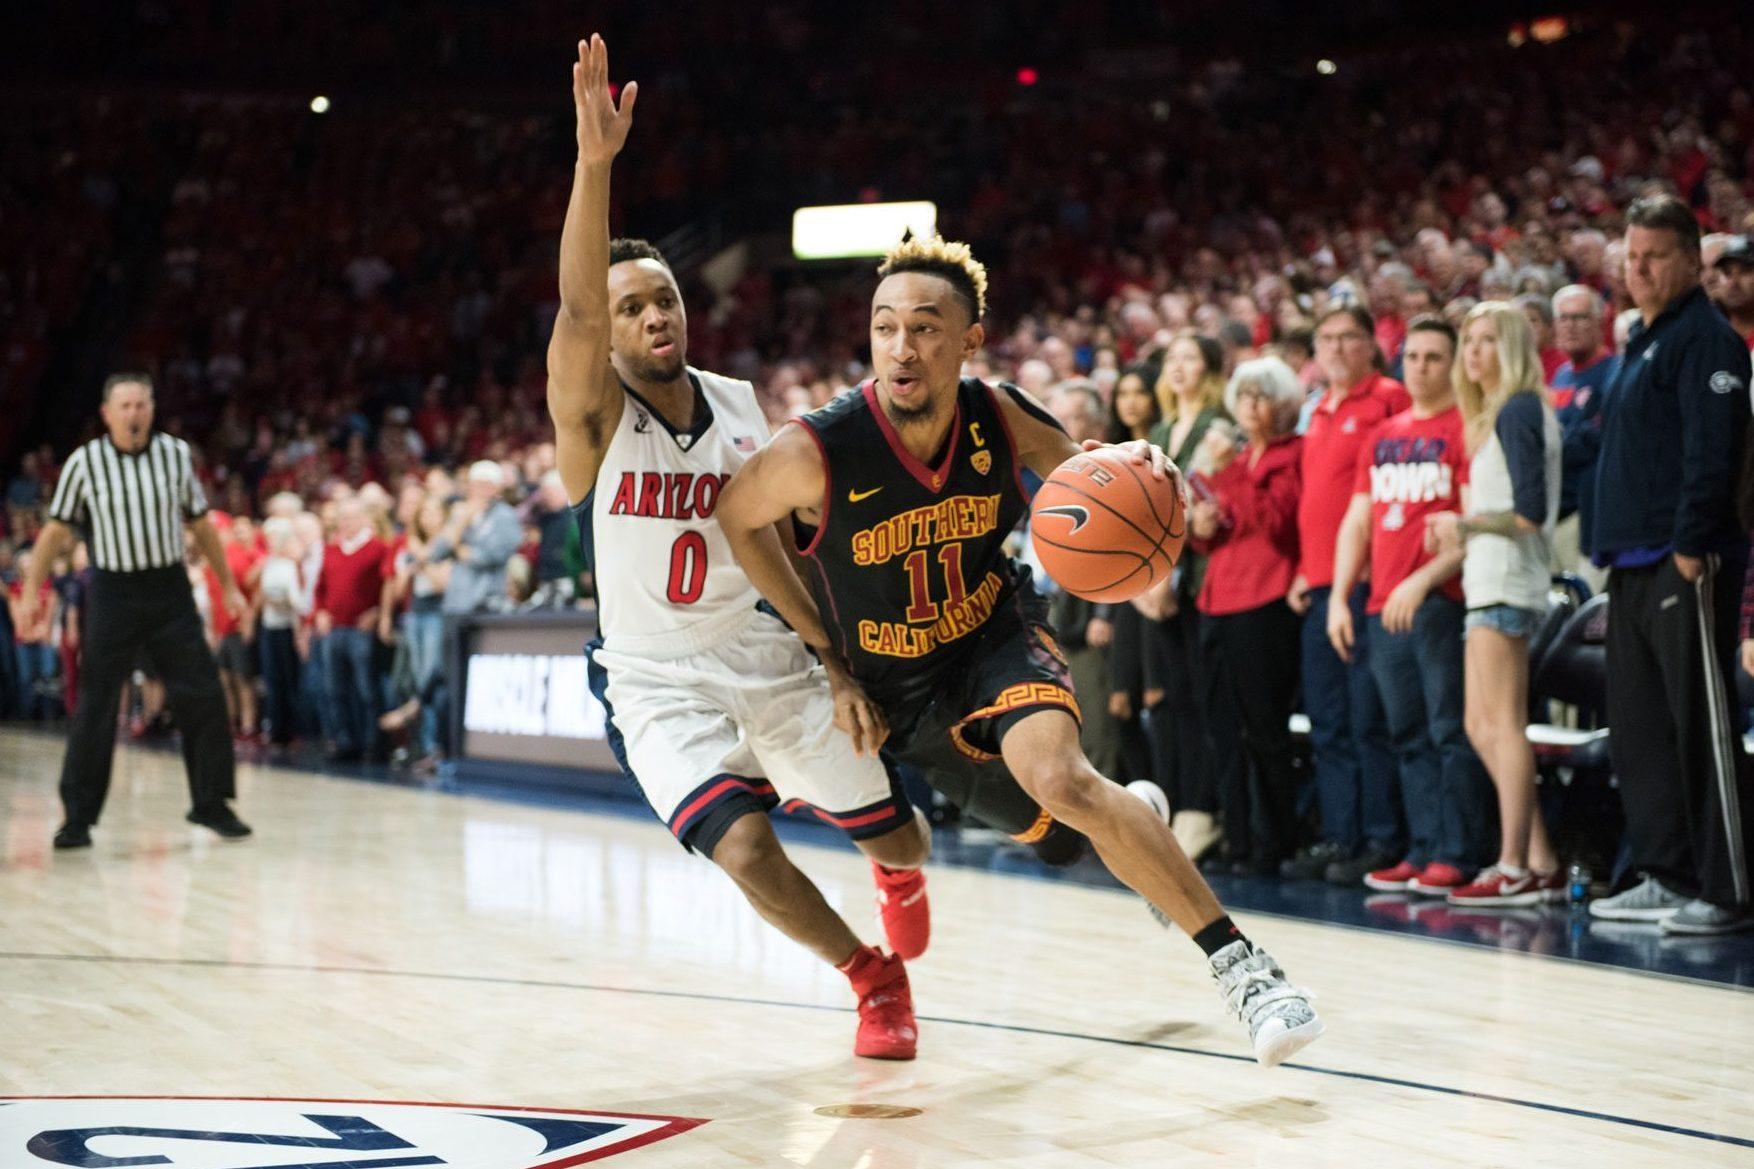 Subir y bajar emoción Samuel  Meet Jordan McLaughlin, the Heart of USC Basketball's Turnaround ...